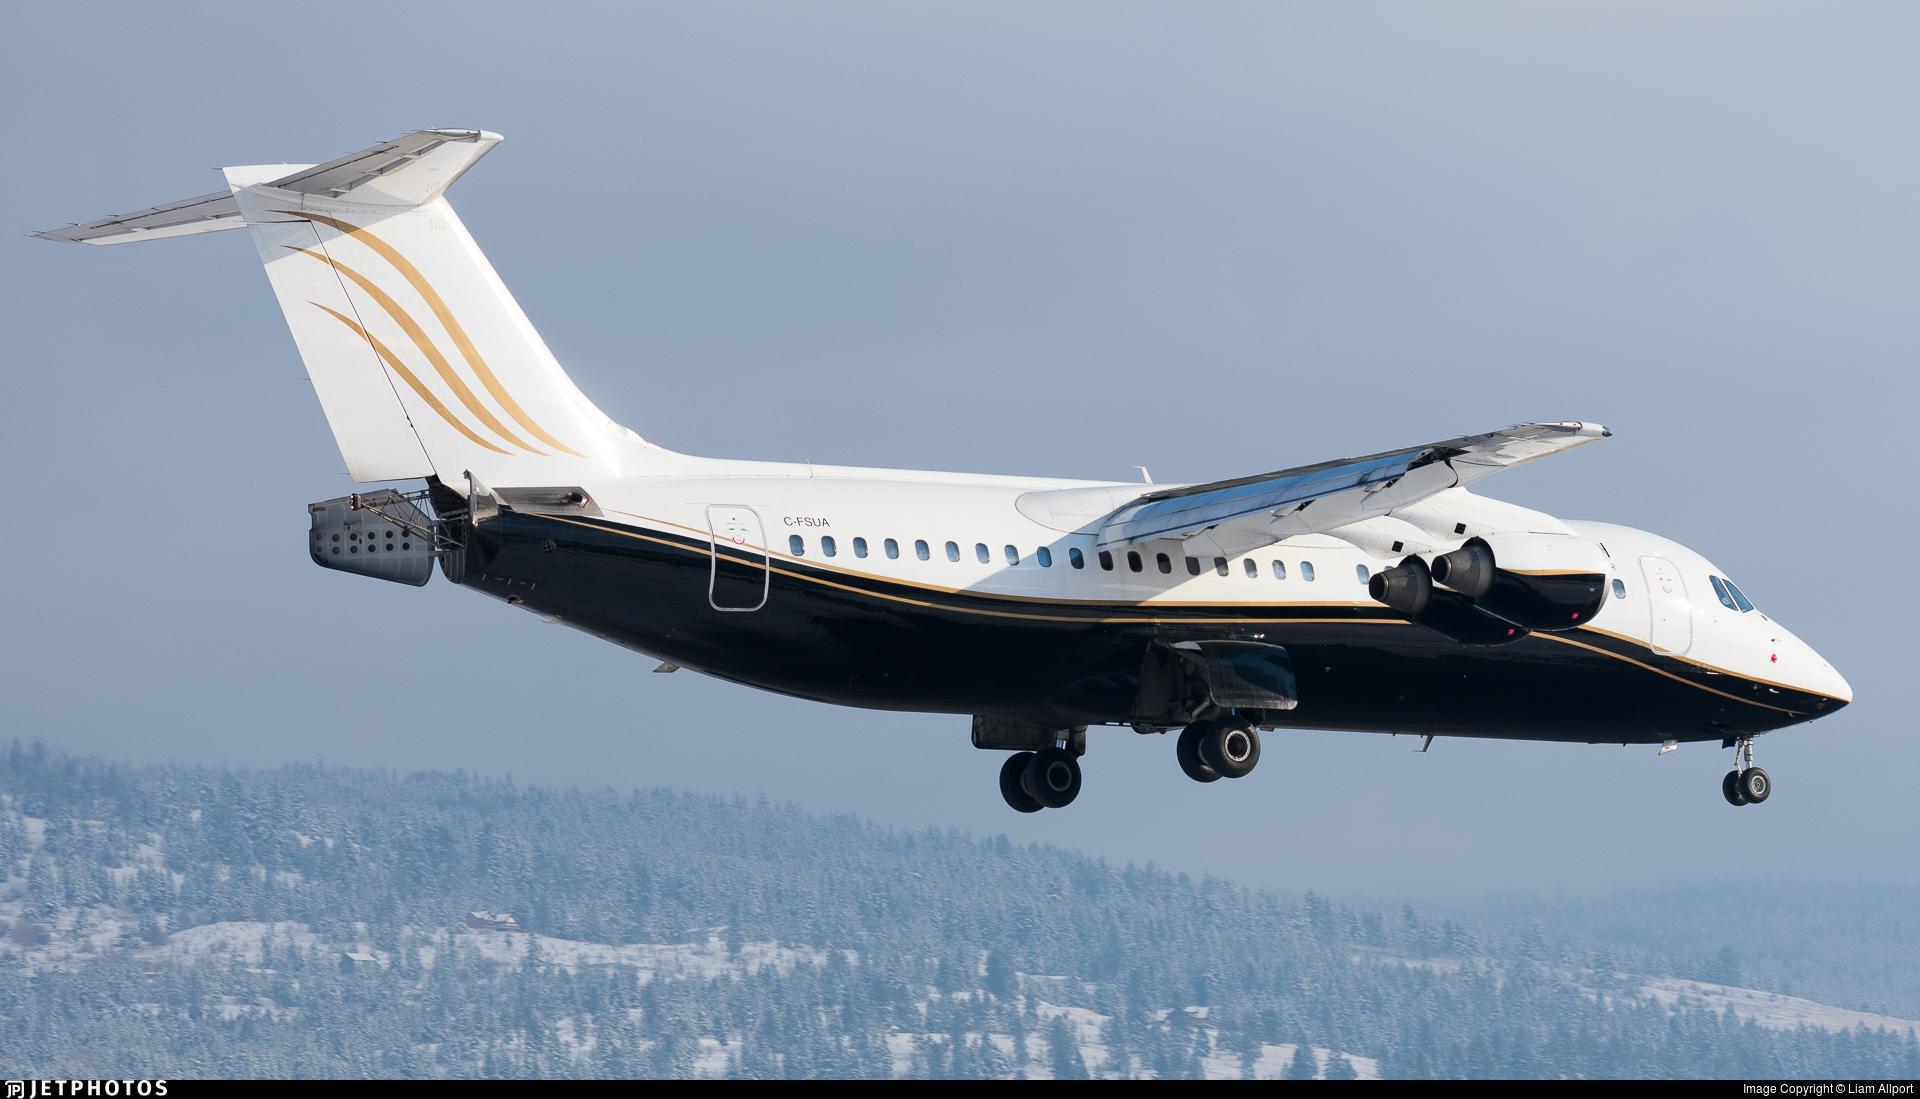 C-FSUA - British Aerospace Avro RJ100 - North Cariboo Air